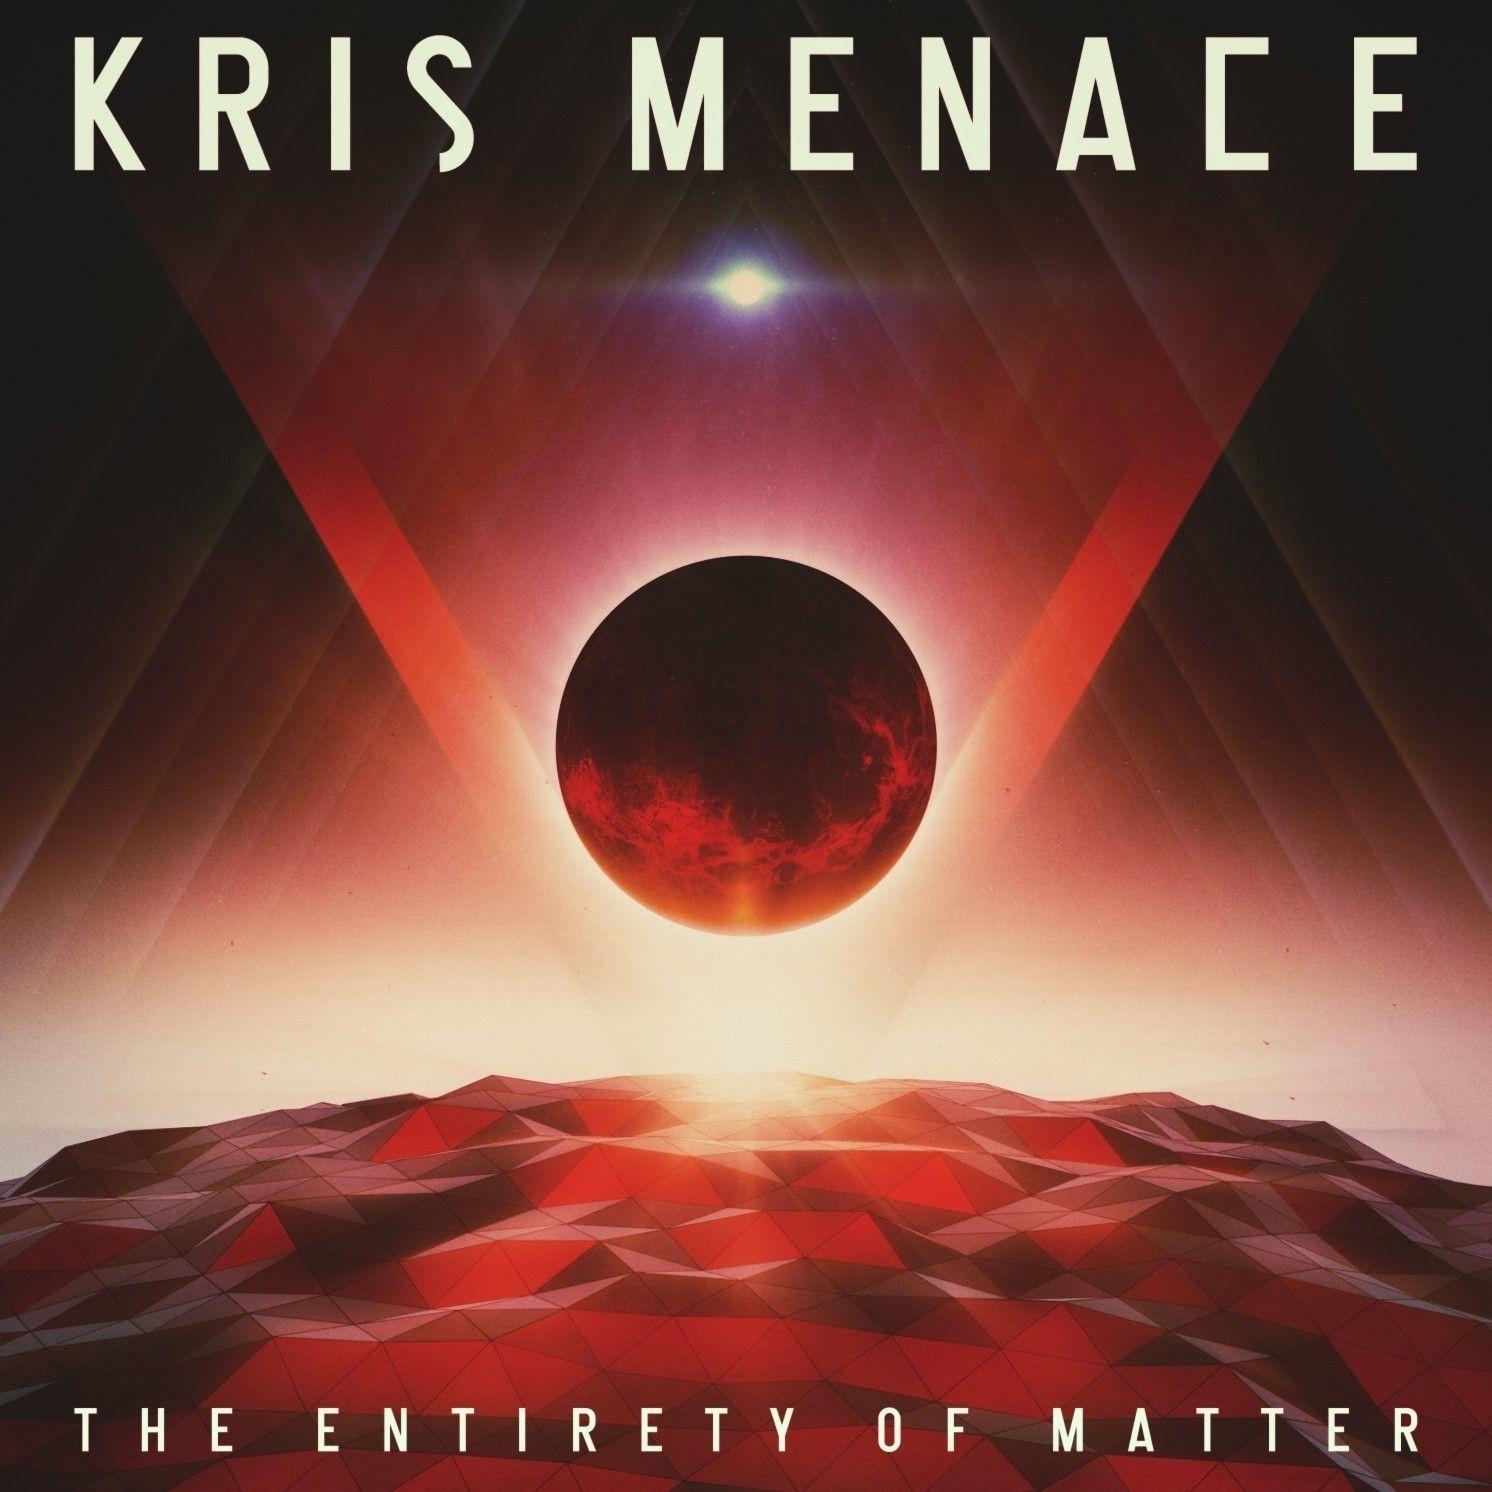 kris-menace-entirety-matter-artwork-copy.jpg